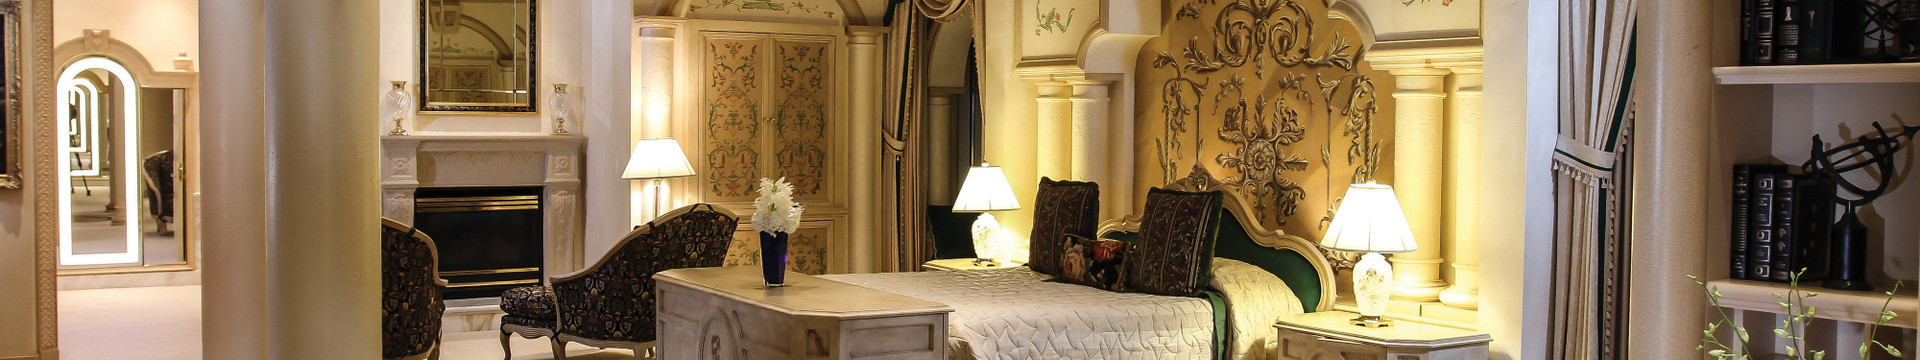 Sky Villas and Sky Suites at our Las Vegas Hotel and Casino | Premium Villa